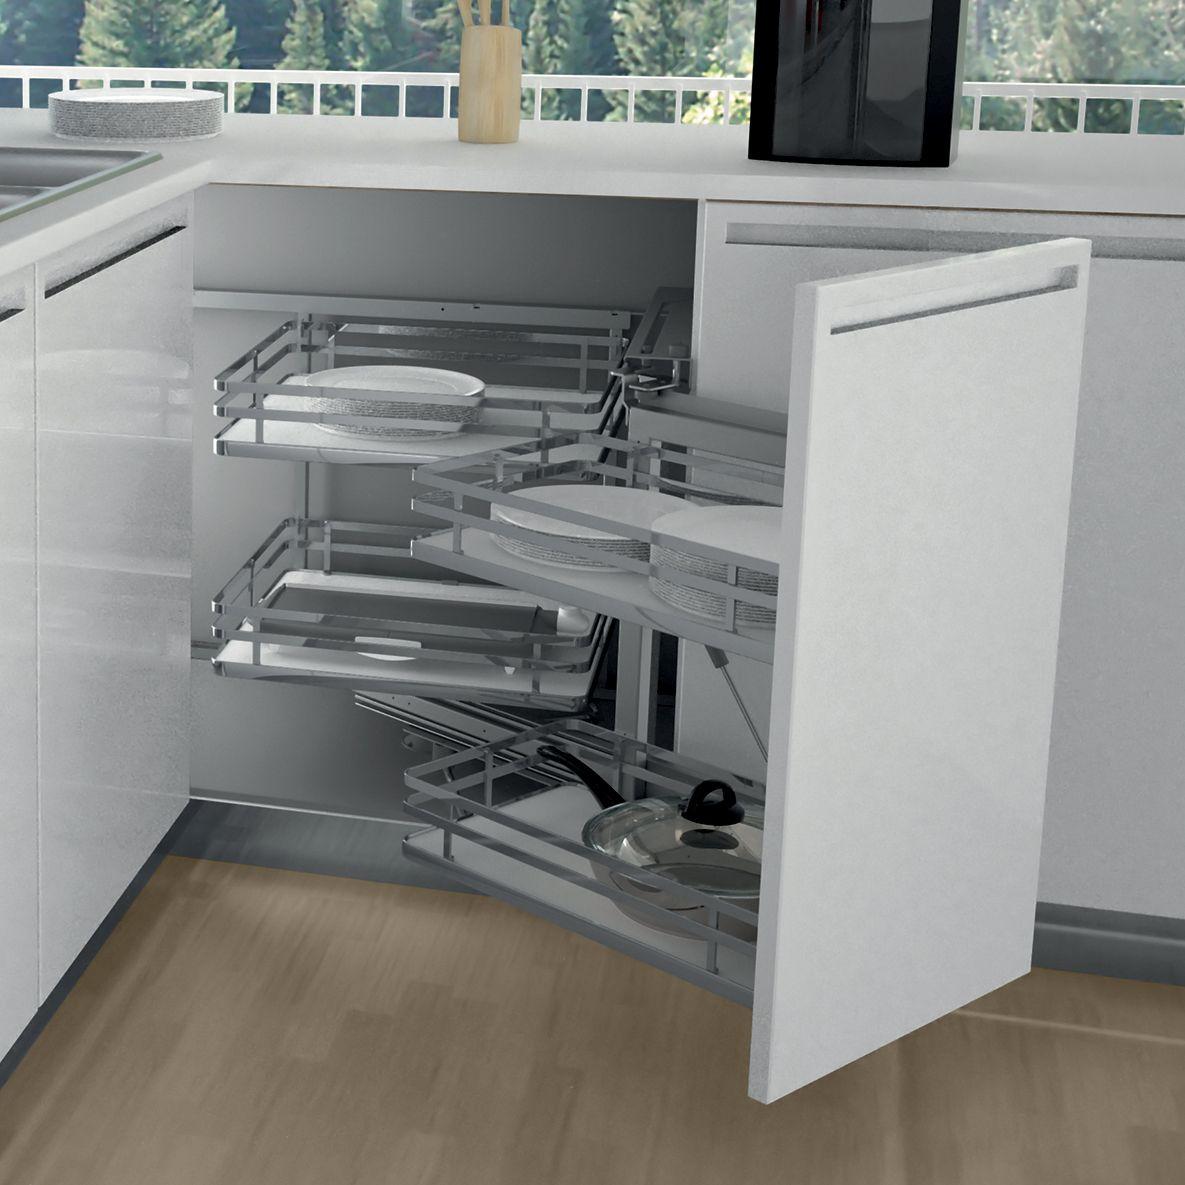 Meuble angle magic corner cuisines teisseire for Accessoire meuble angle cuisine